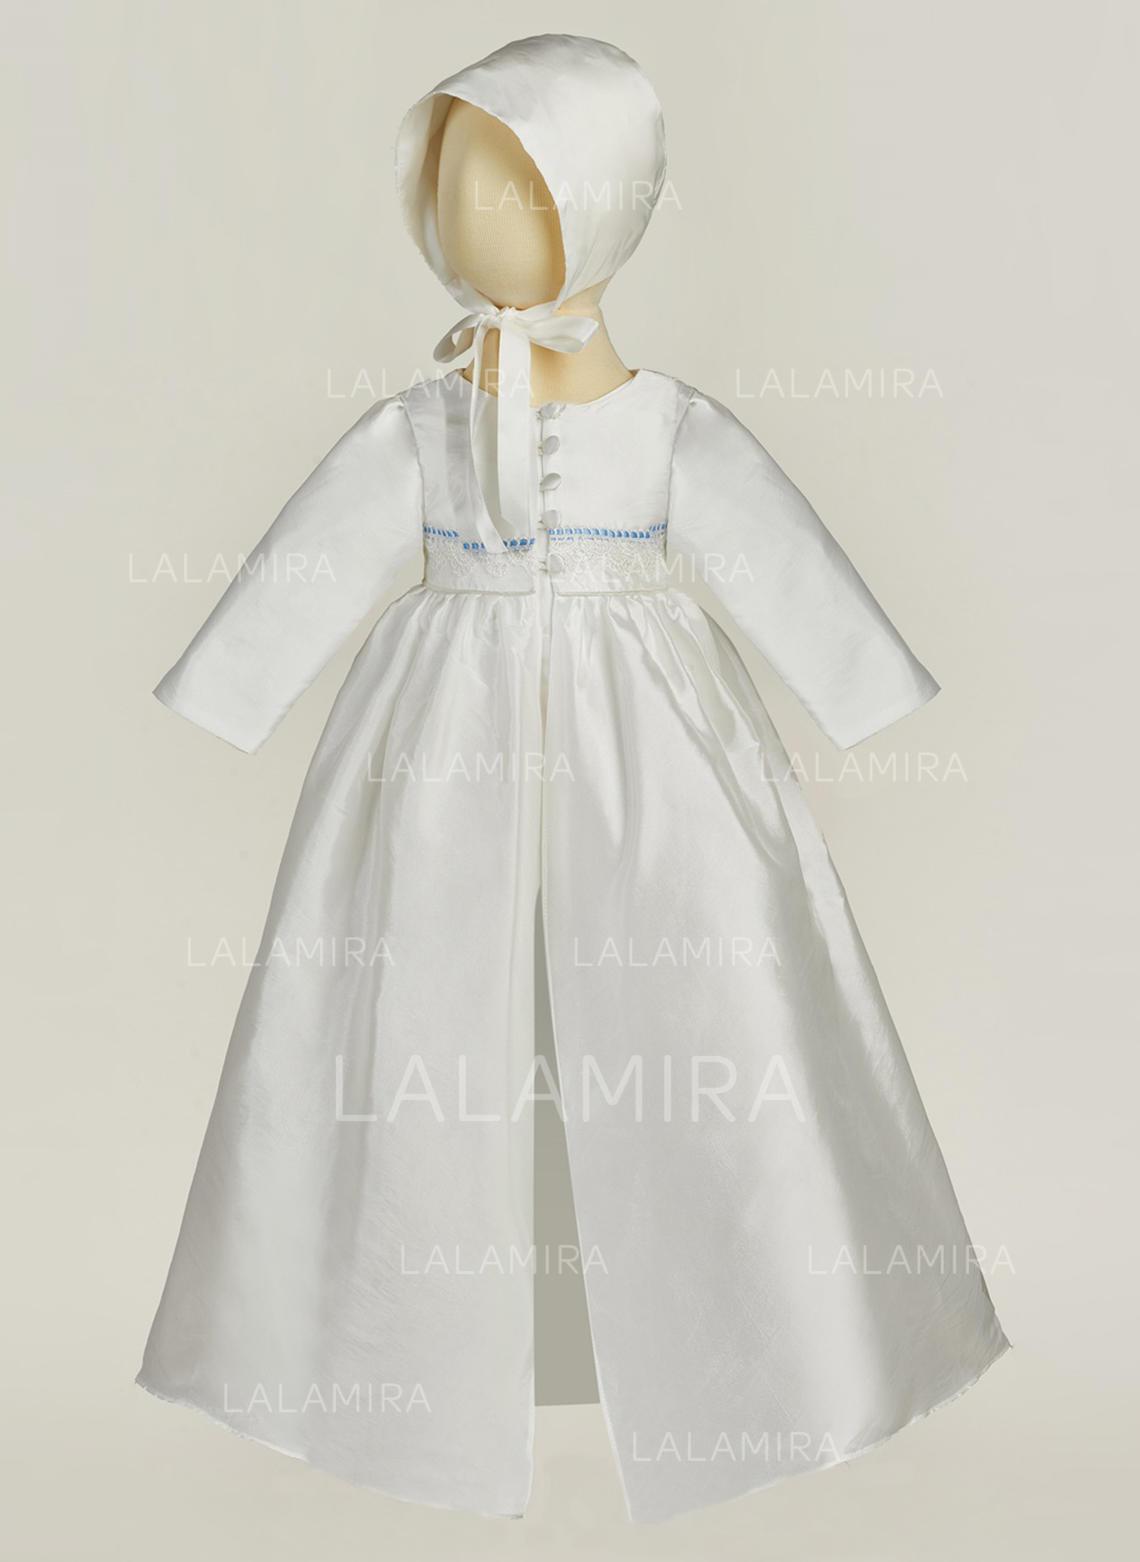 ec5fe7543 Satén Escote en V Vestidos de bautizo para bebés con Manga larga  (2001217410). Loading zoom. Cargando